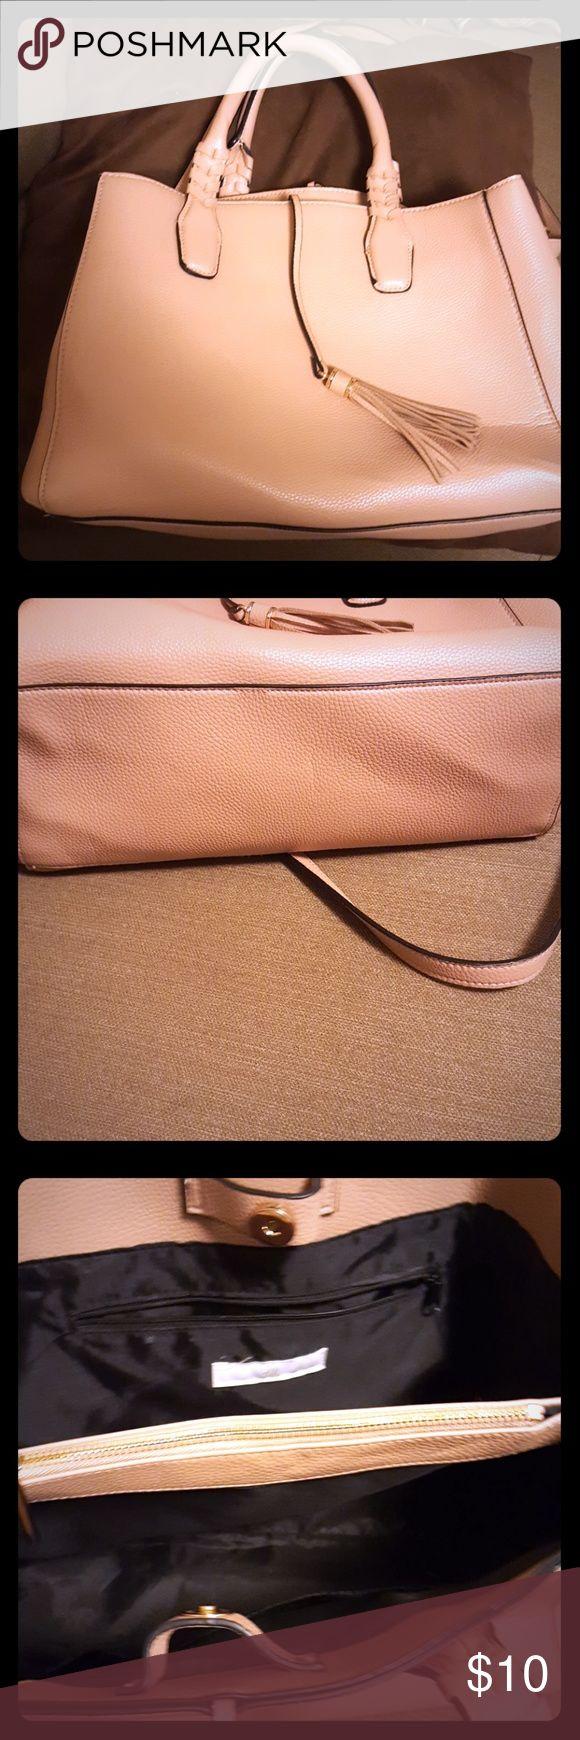 H&M purse Mauve colored H&M purse. No visible wear. Includes removable shoulder strap. Perfect color for Spring/Summer. H&M Bags Satchels